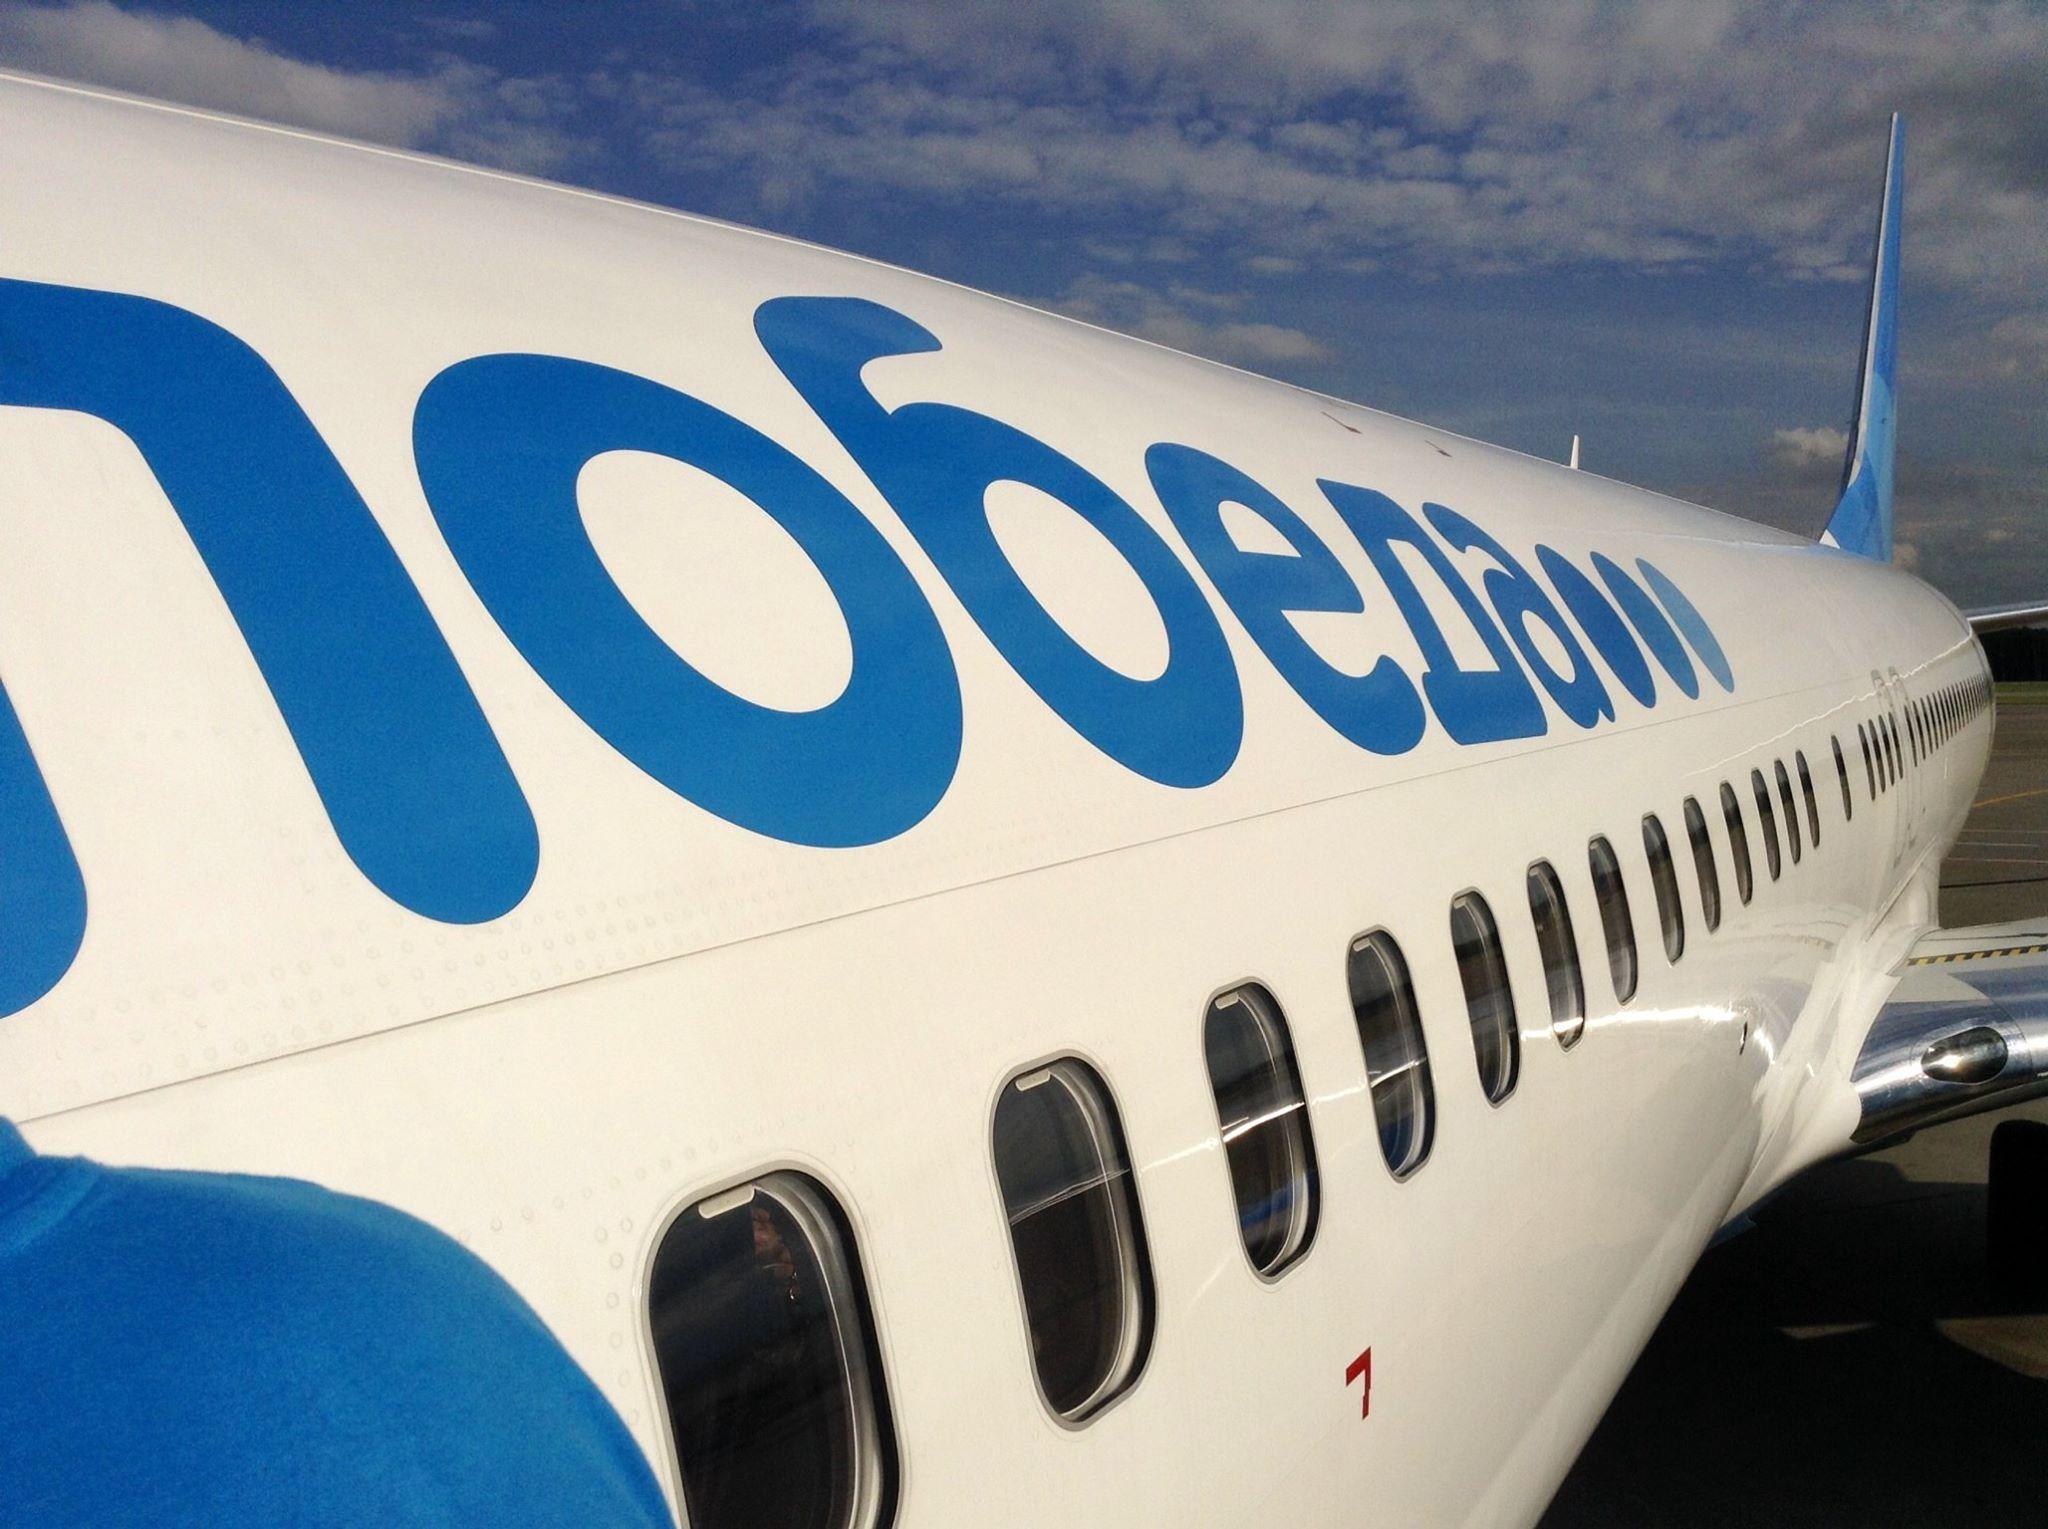 Анапа пермь самолет прямой рейс цена победа билета на самолет картинки